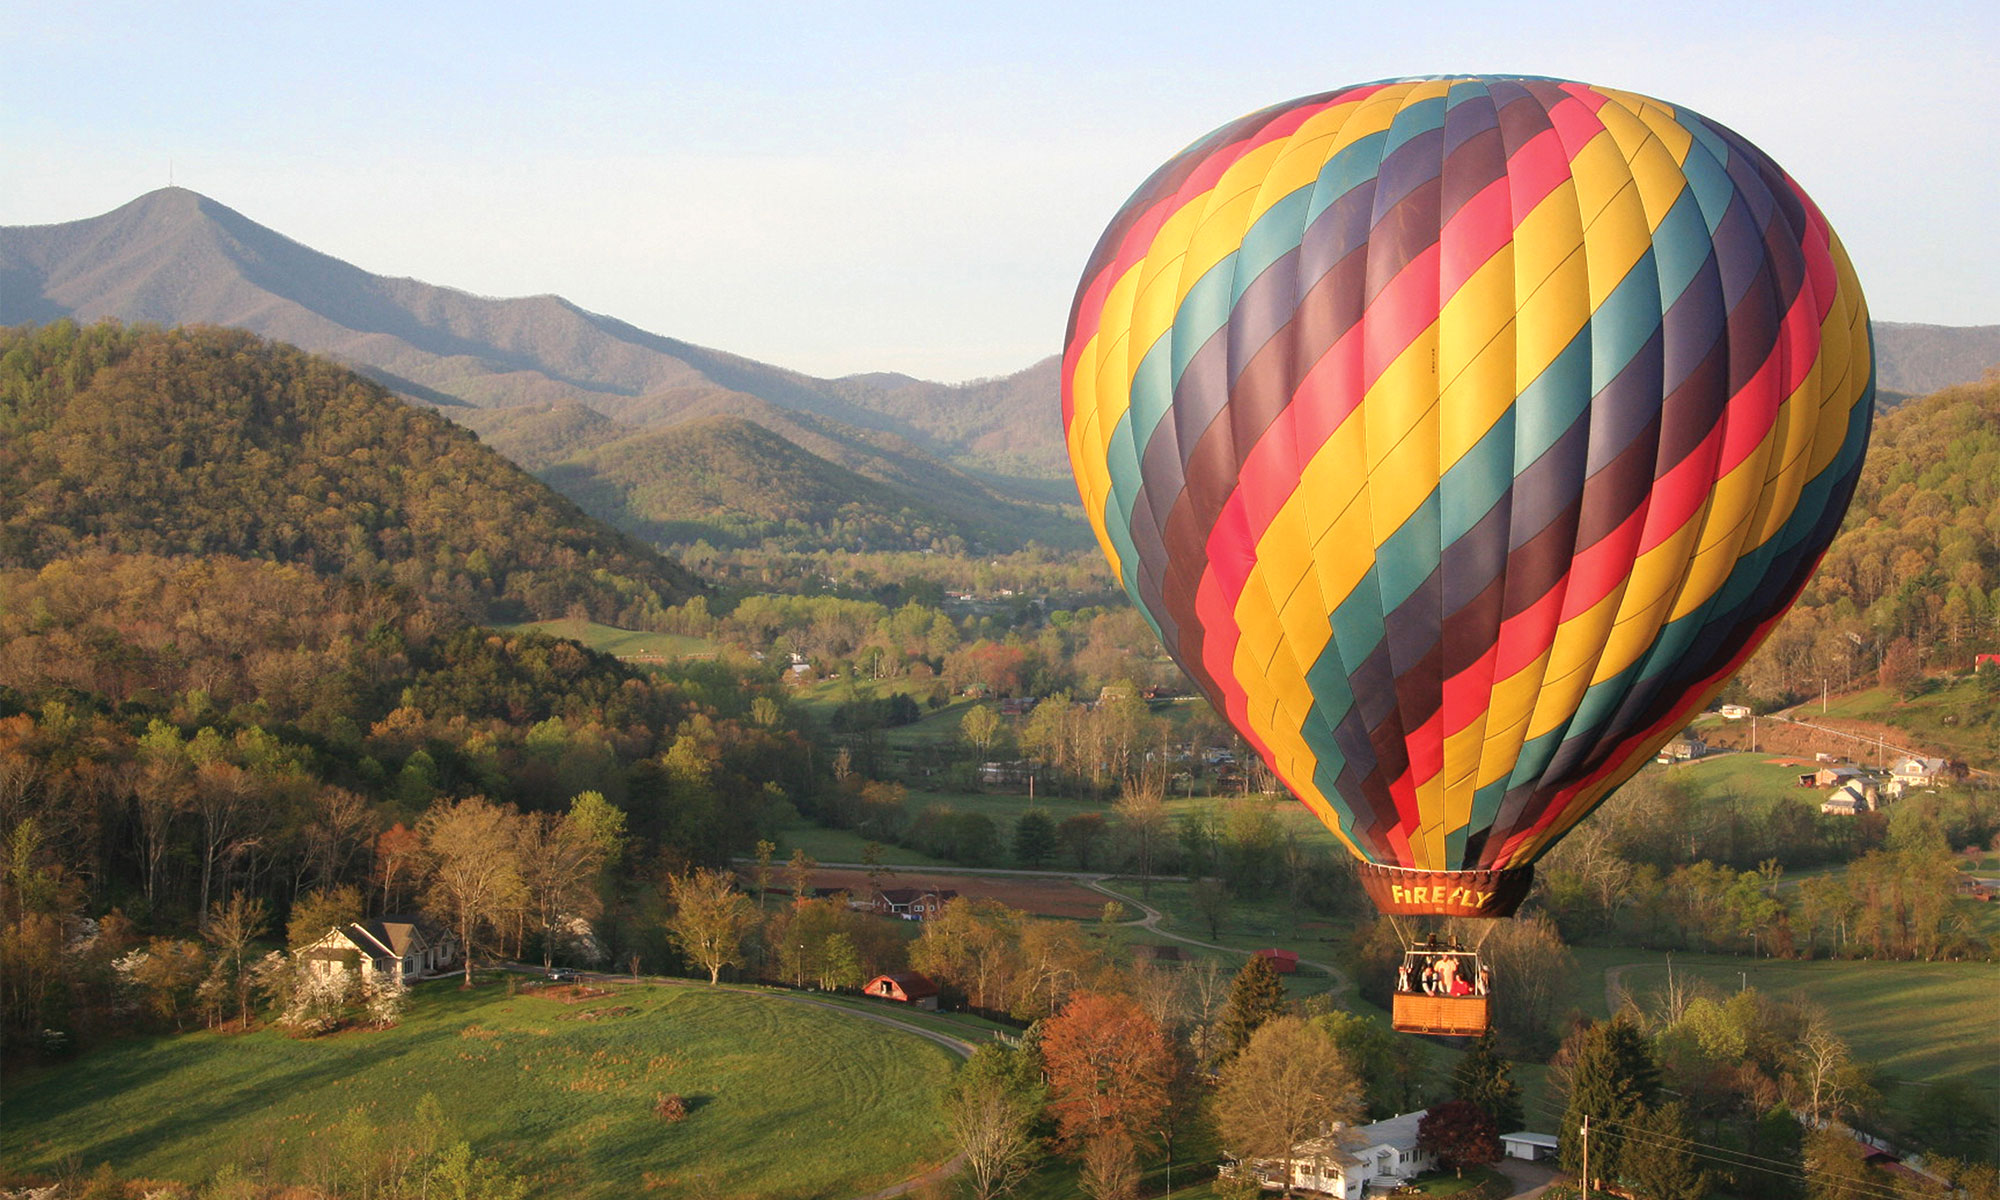 Mt Pisgah Balloon in Spring